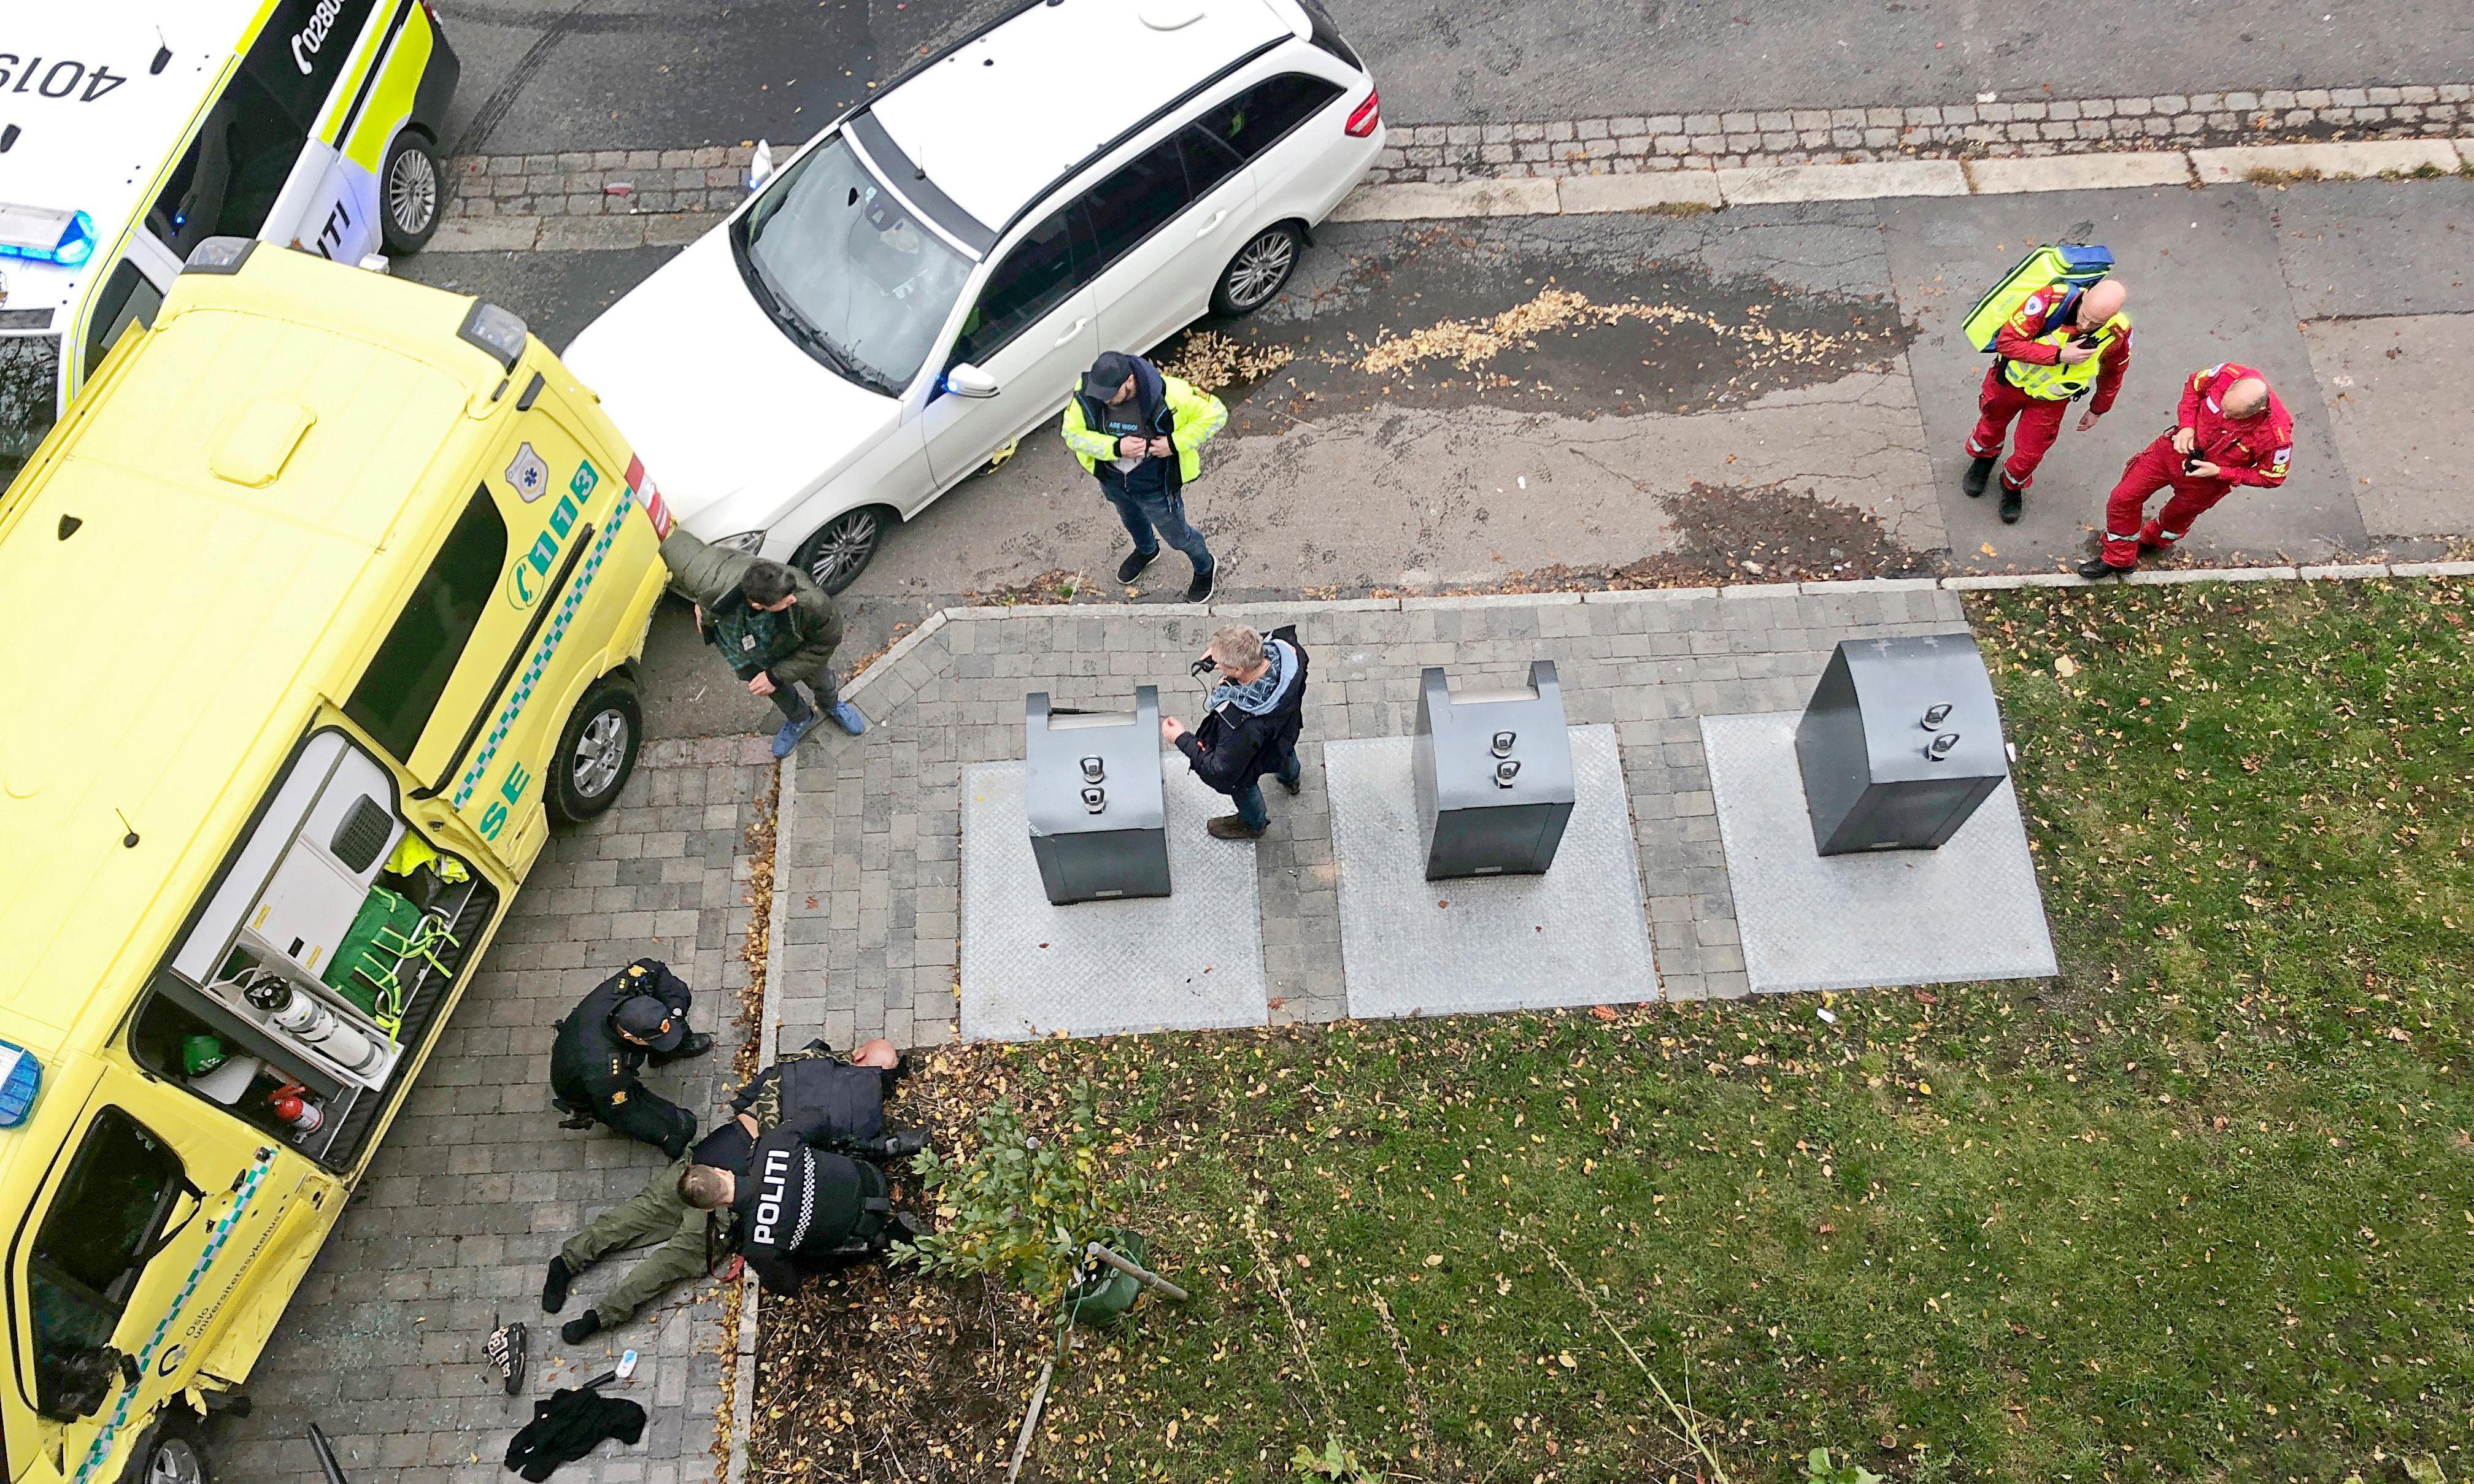 Several injured as armed man hijacks ambulance in Oslo